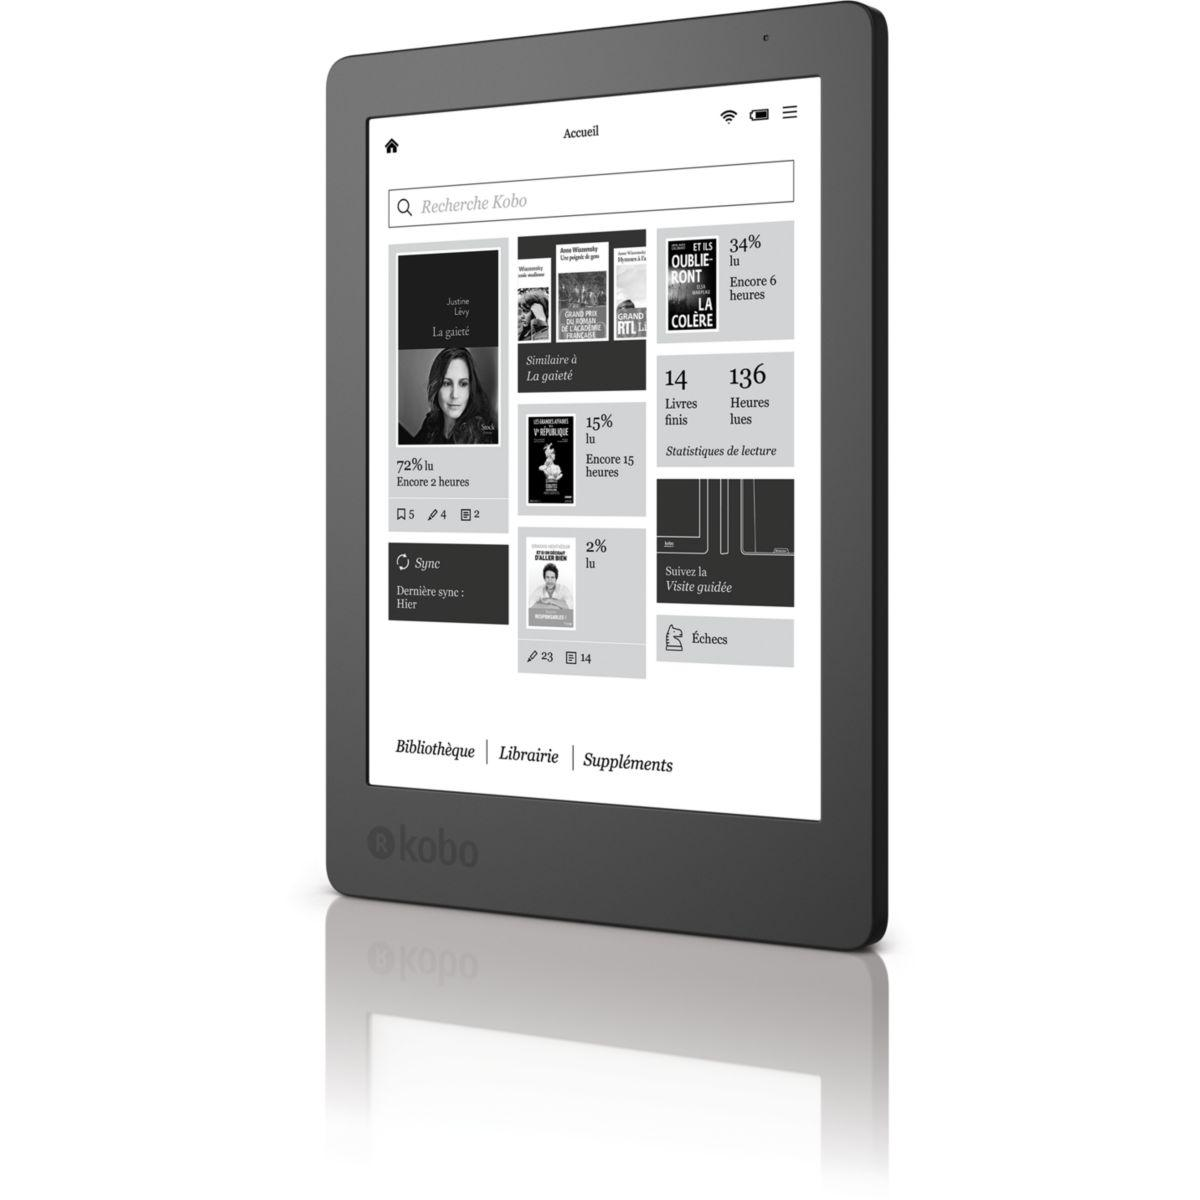 E-book kobo aura 2 - 2% de remise immédiate avec le code : anniv2 (photo)